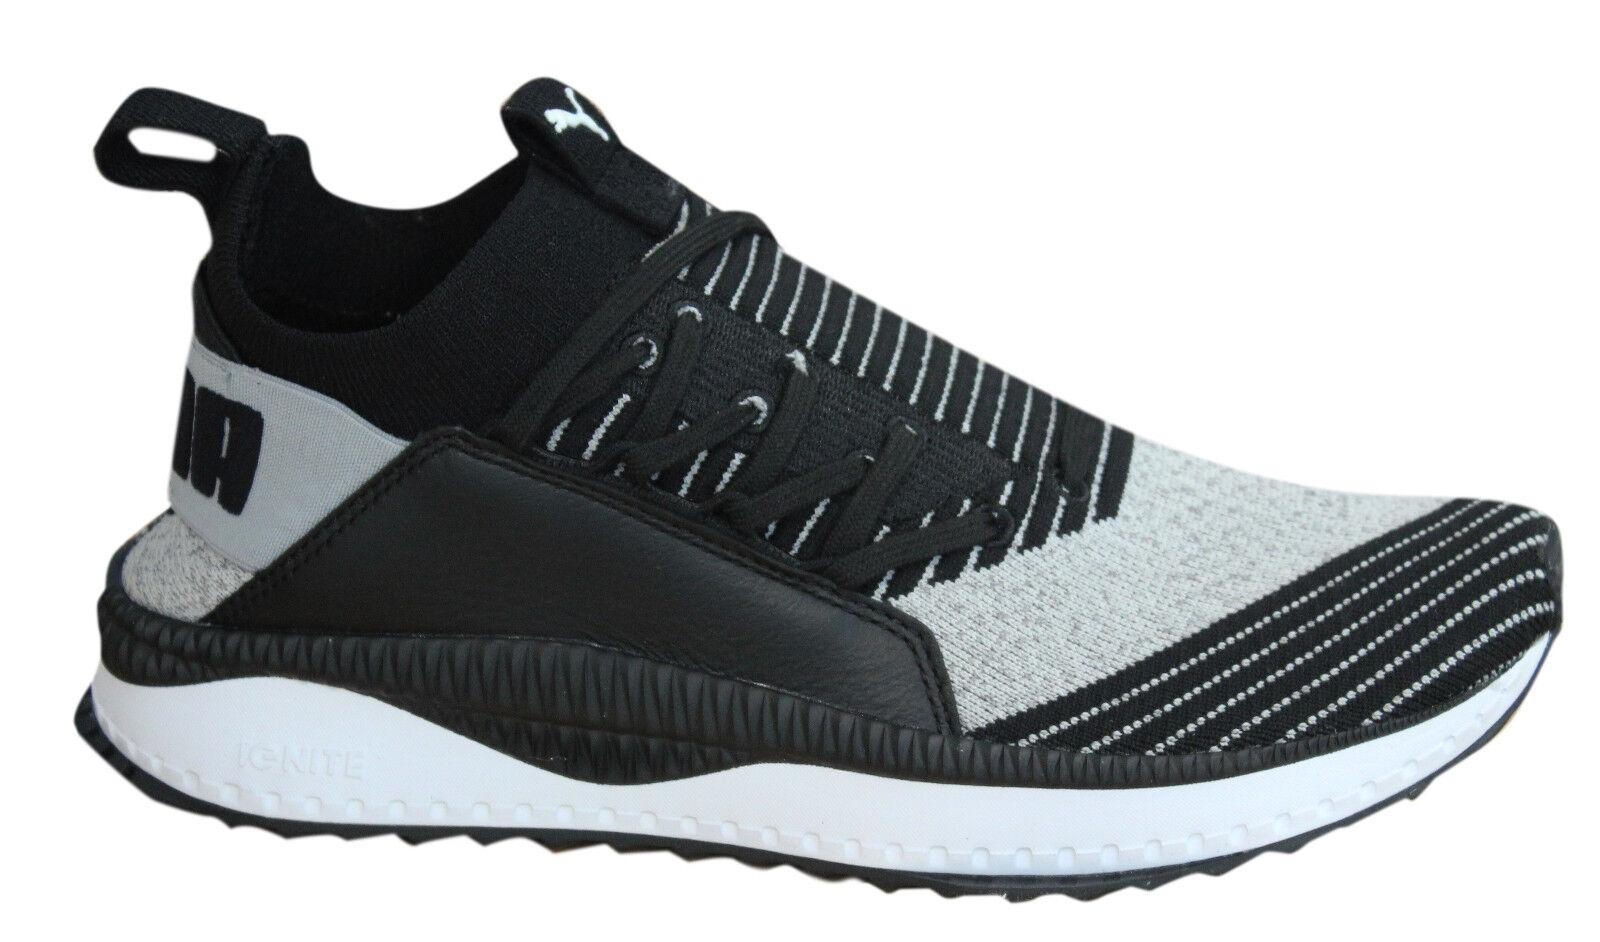 Puma TSUGI Jun Lace Up Grey Black Sock Fit Mens Trainers Shoes 365489 03 U60